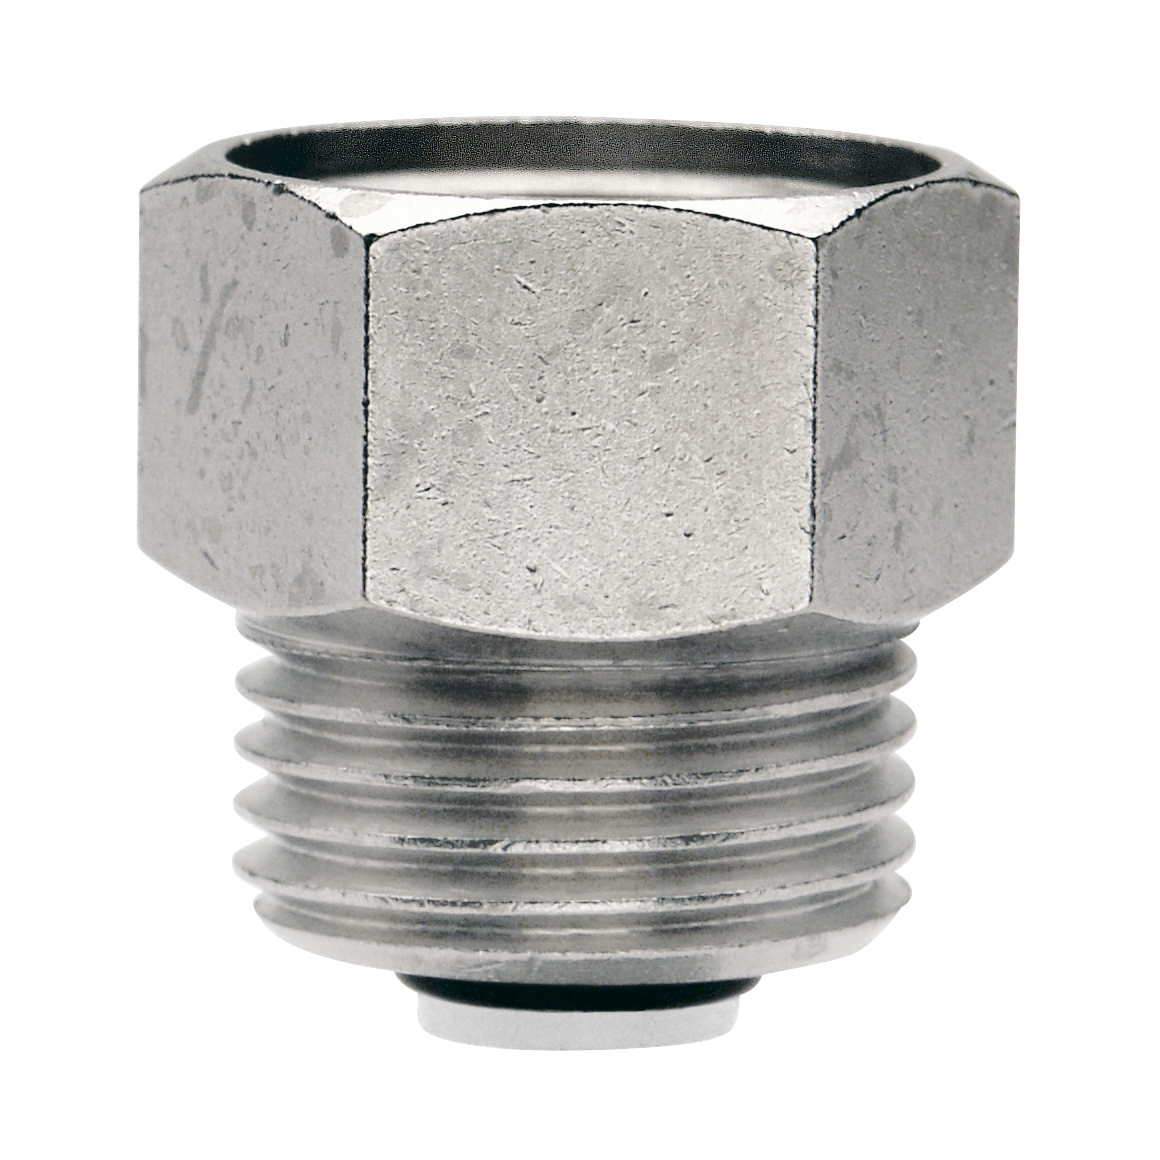 Клапан отсекающий Itap 1/2 в/н для монтажа / демонтажа воздухоотводчика itap 143 1 2 редуктор давления